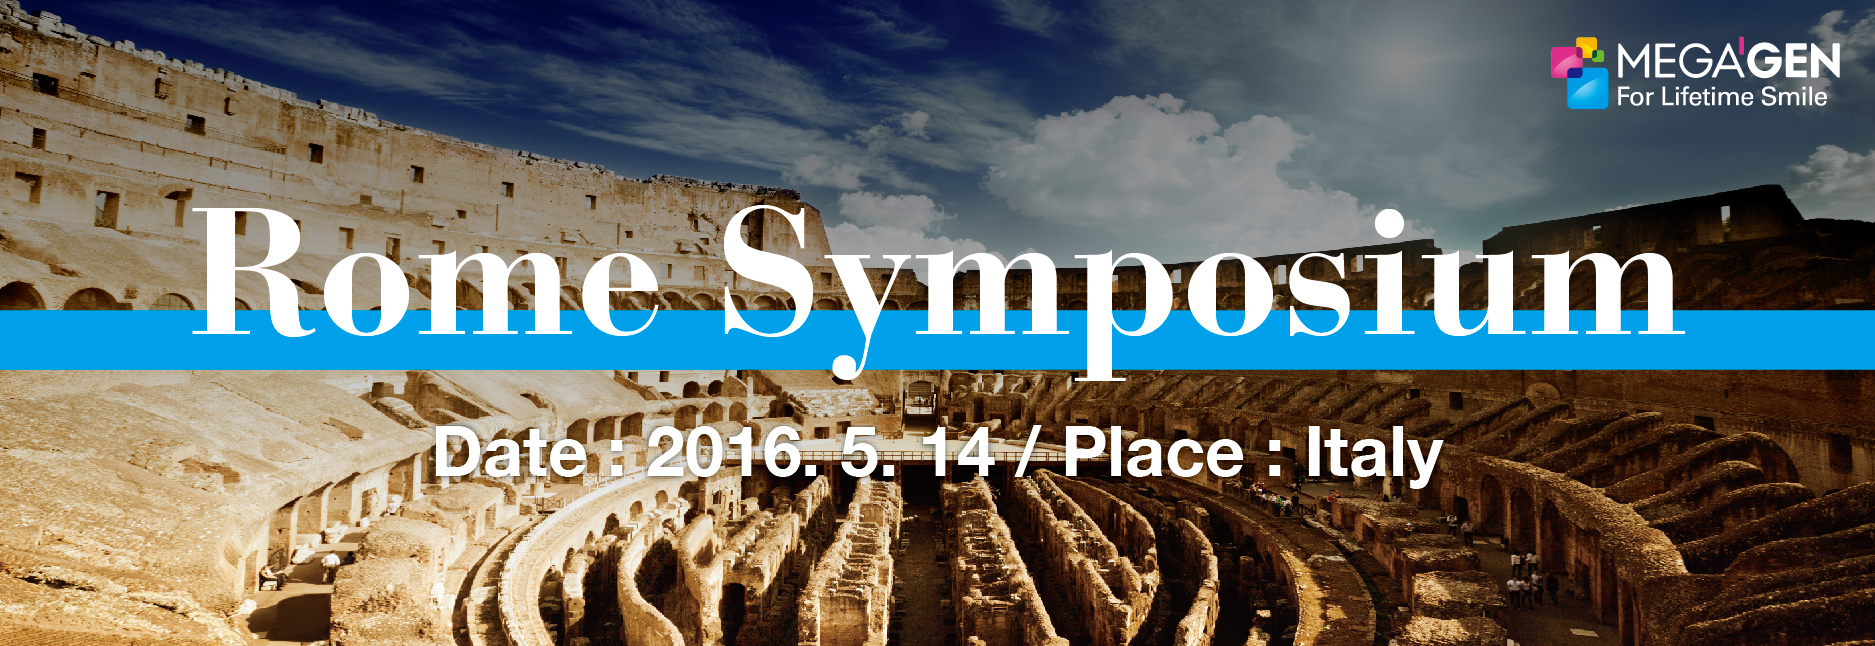 MegaGen Symposium in Italy